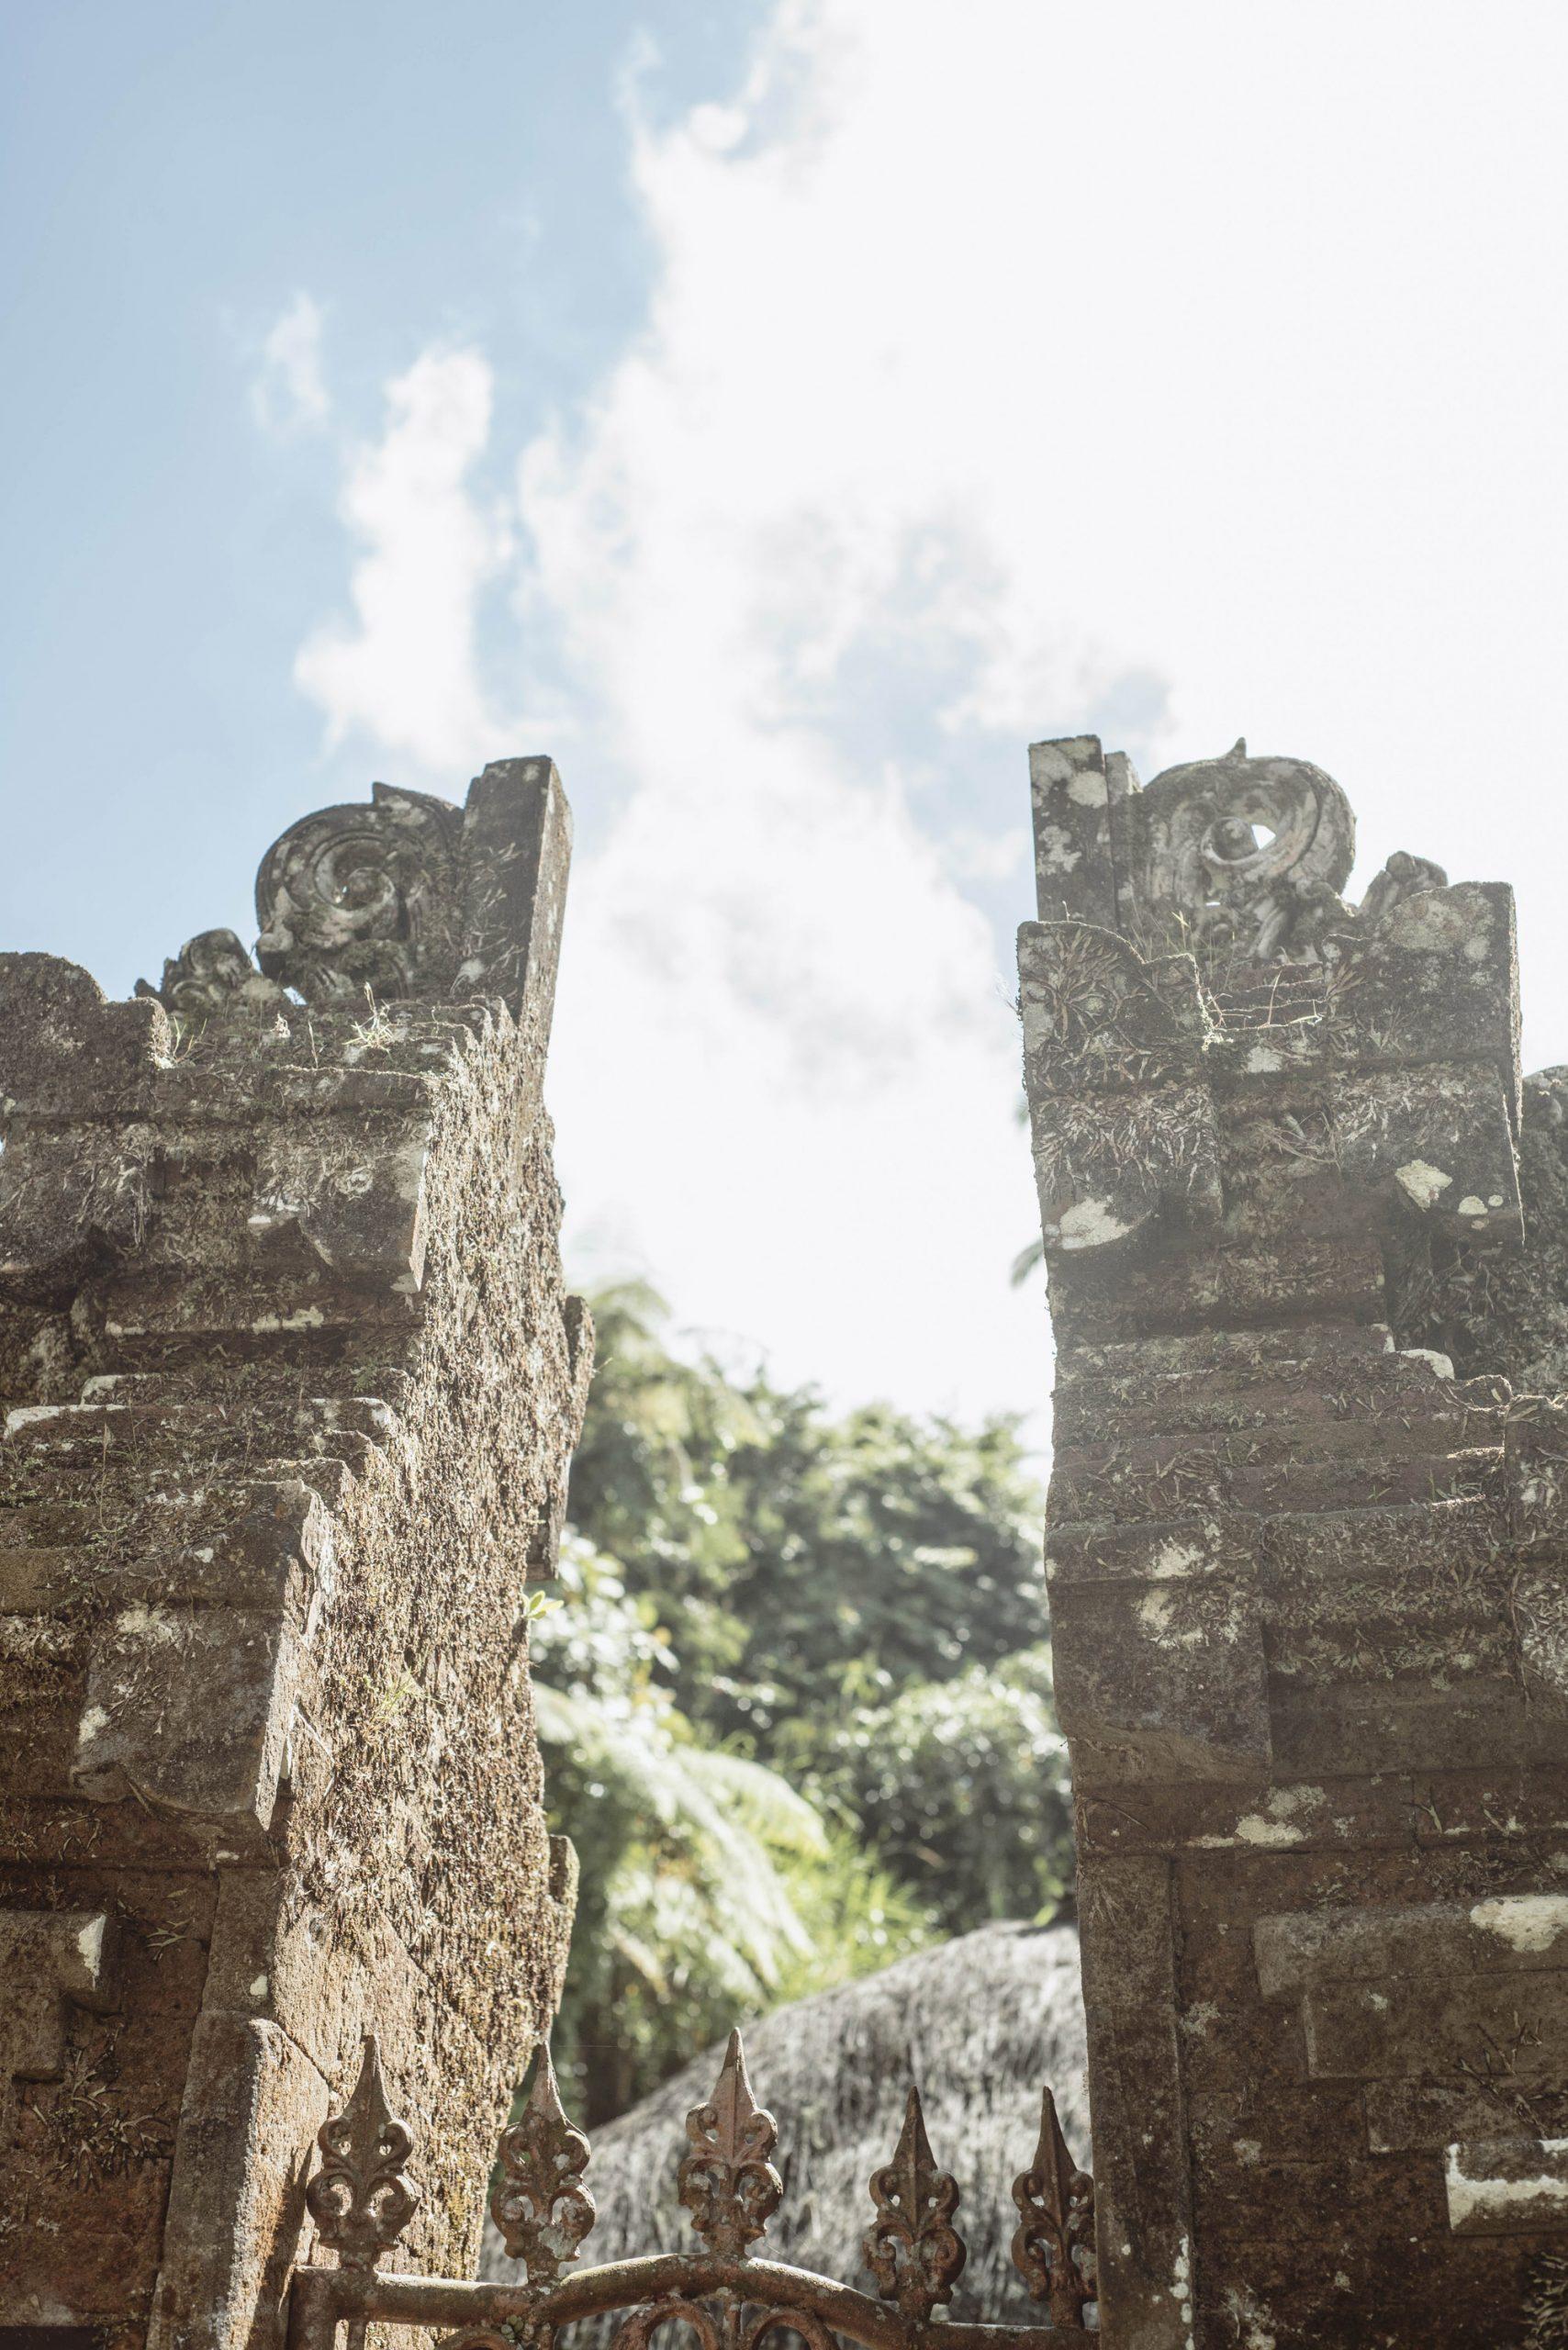 Categorie: Landscape & Nature, Reportage; Photographer: AURORA LIPERINI; Location: Bali, Indonesia